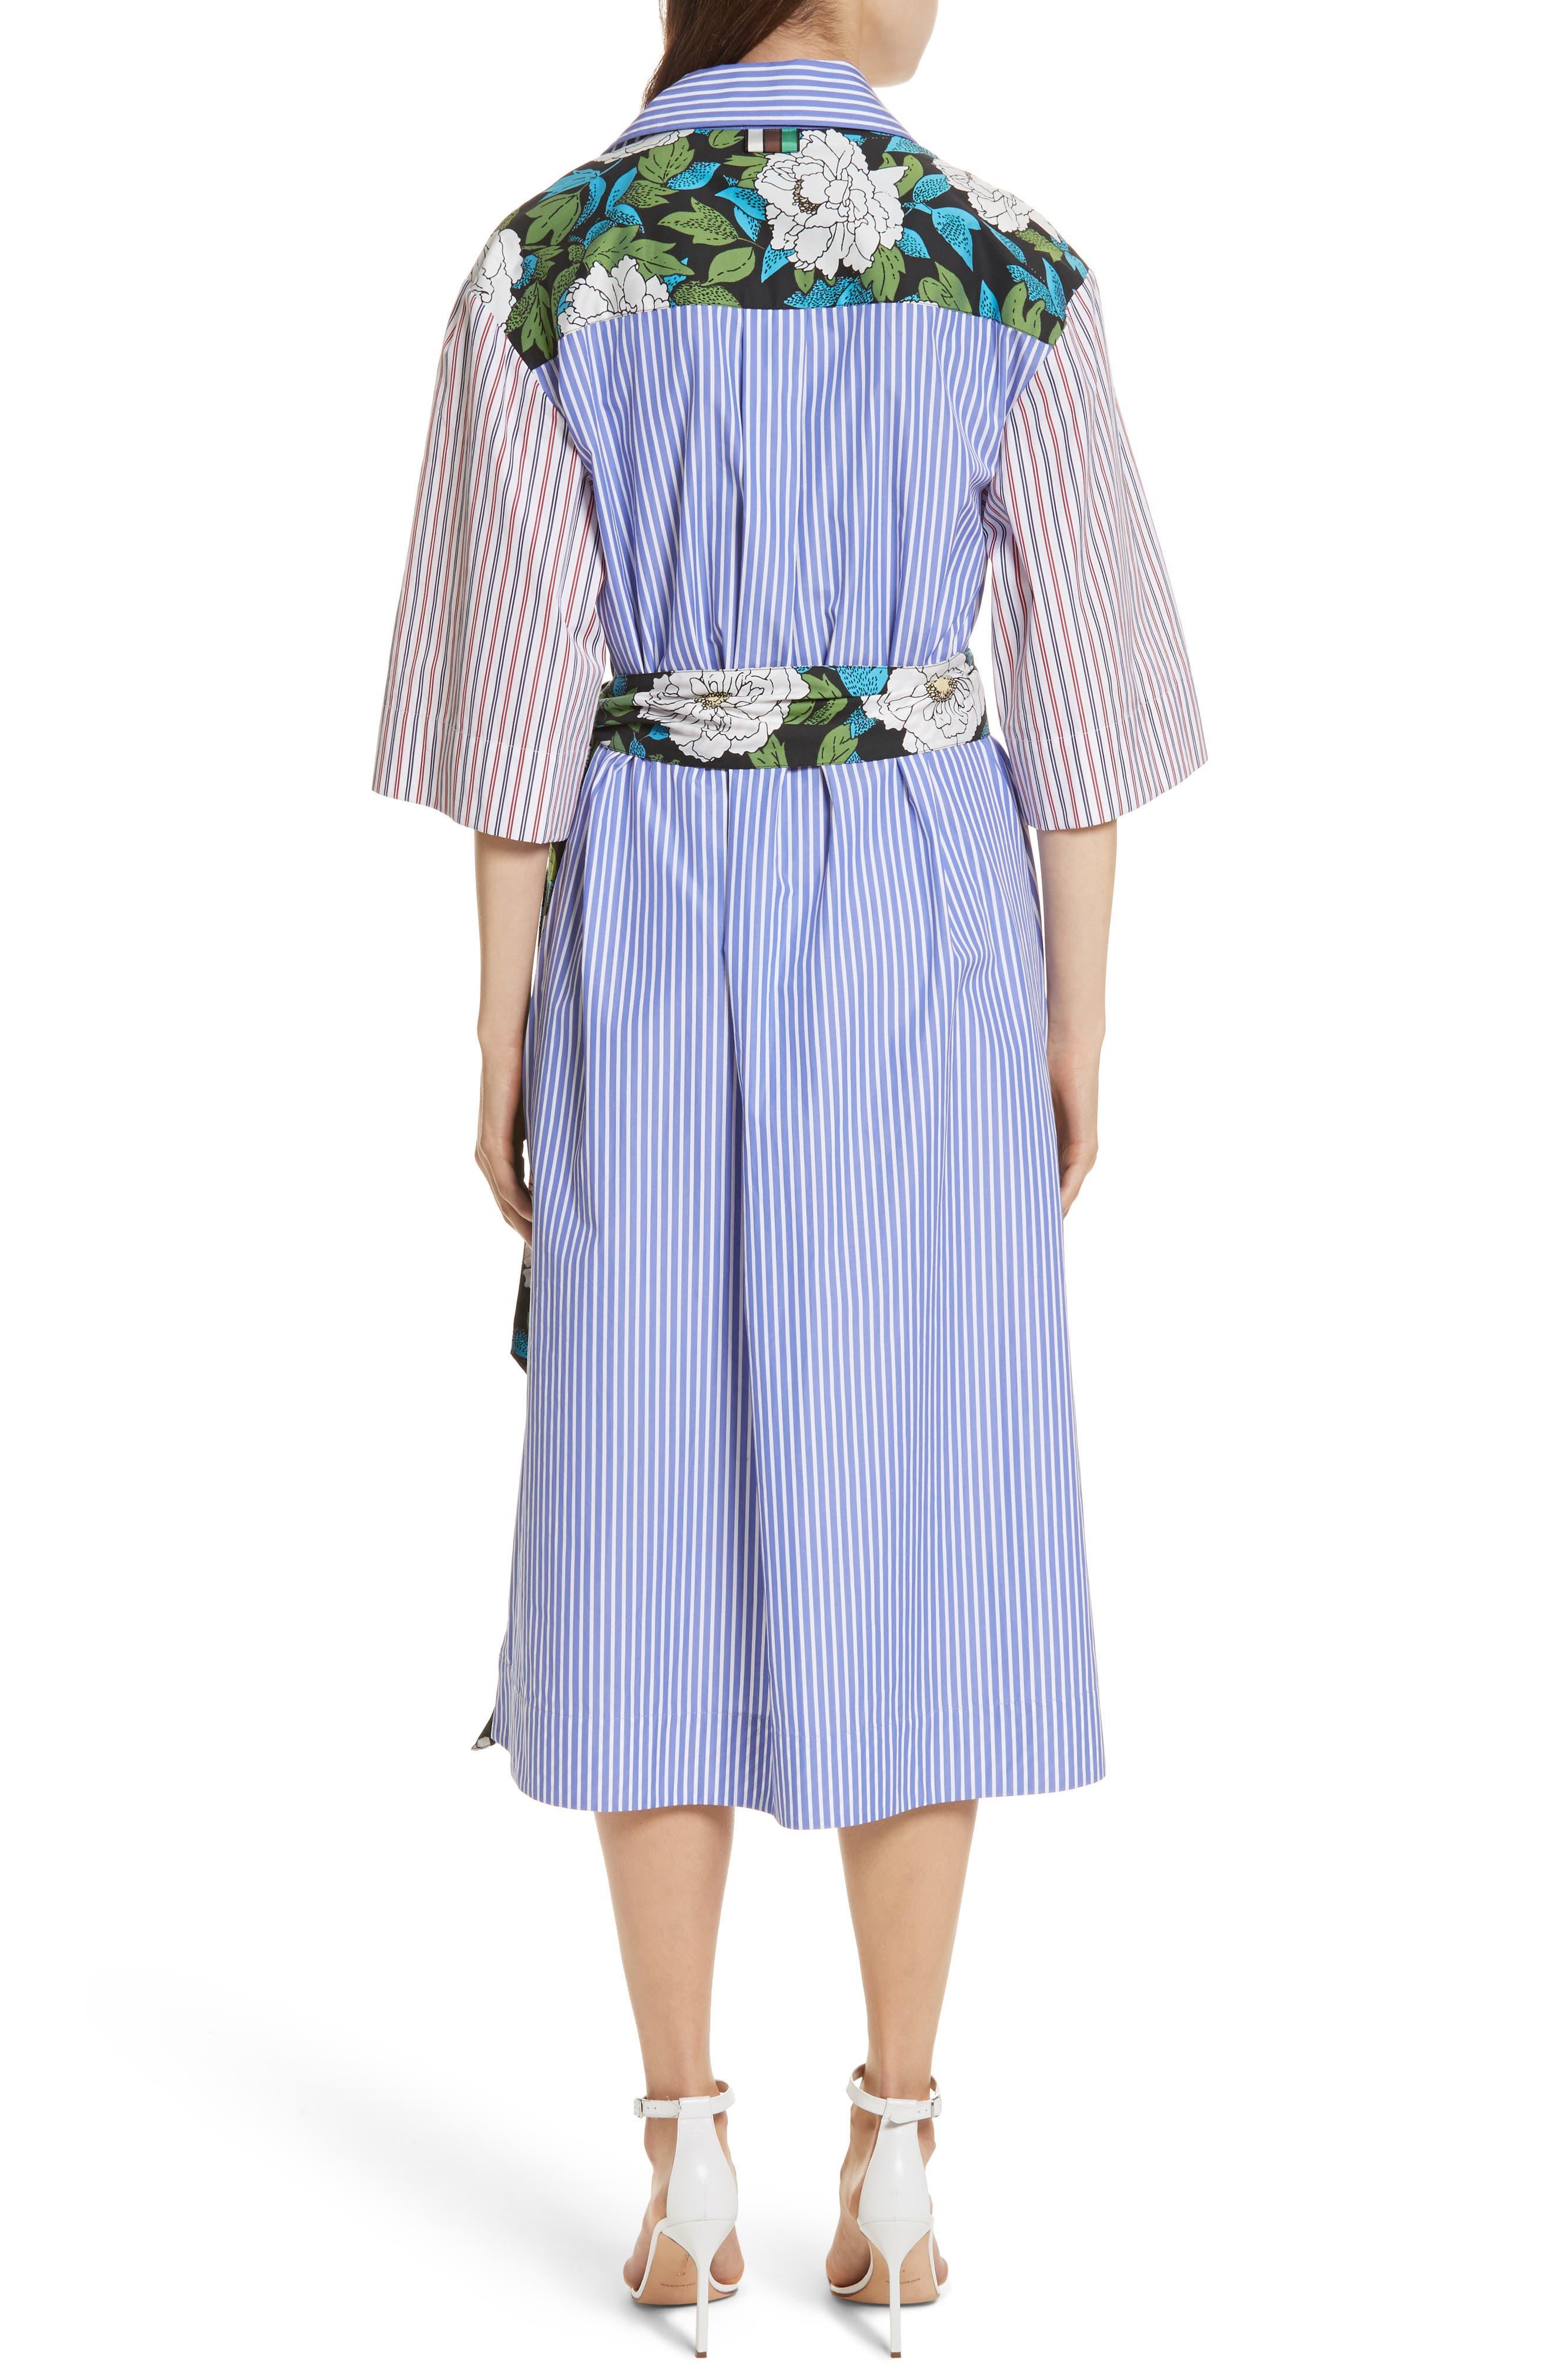 Diane von Furstenberg Mixed Print Cotton Shirtdress,                             Alternate thumbnail 2, color,